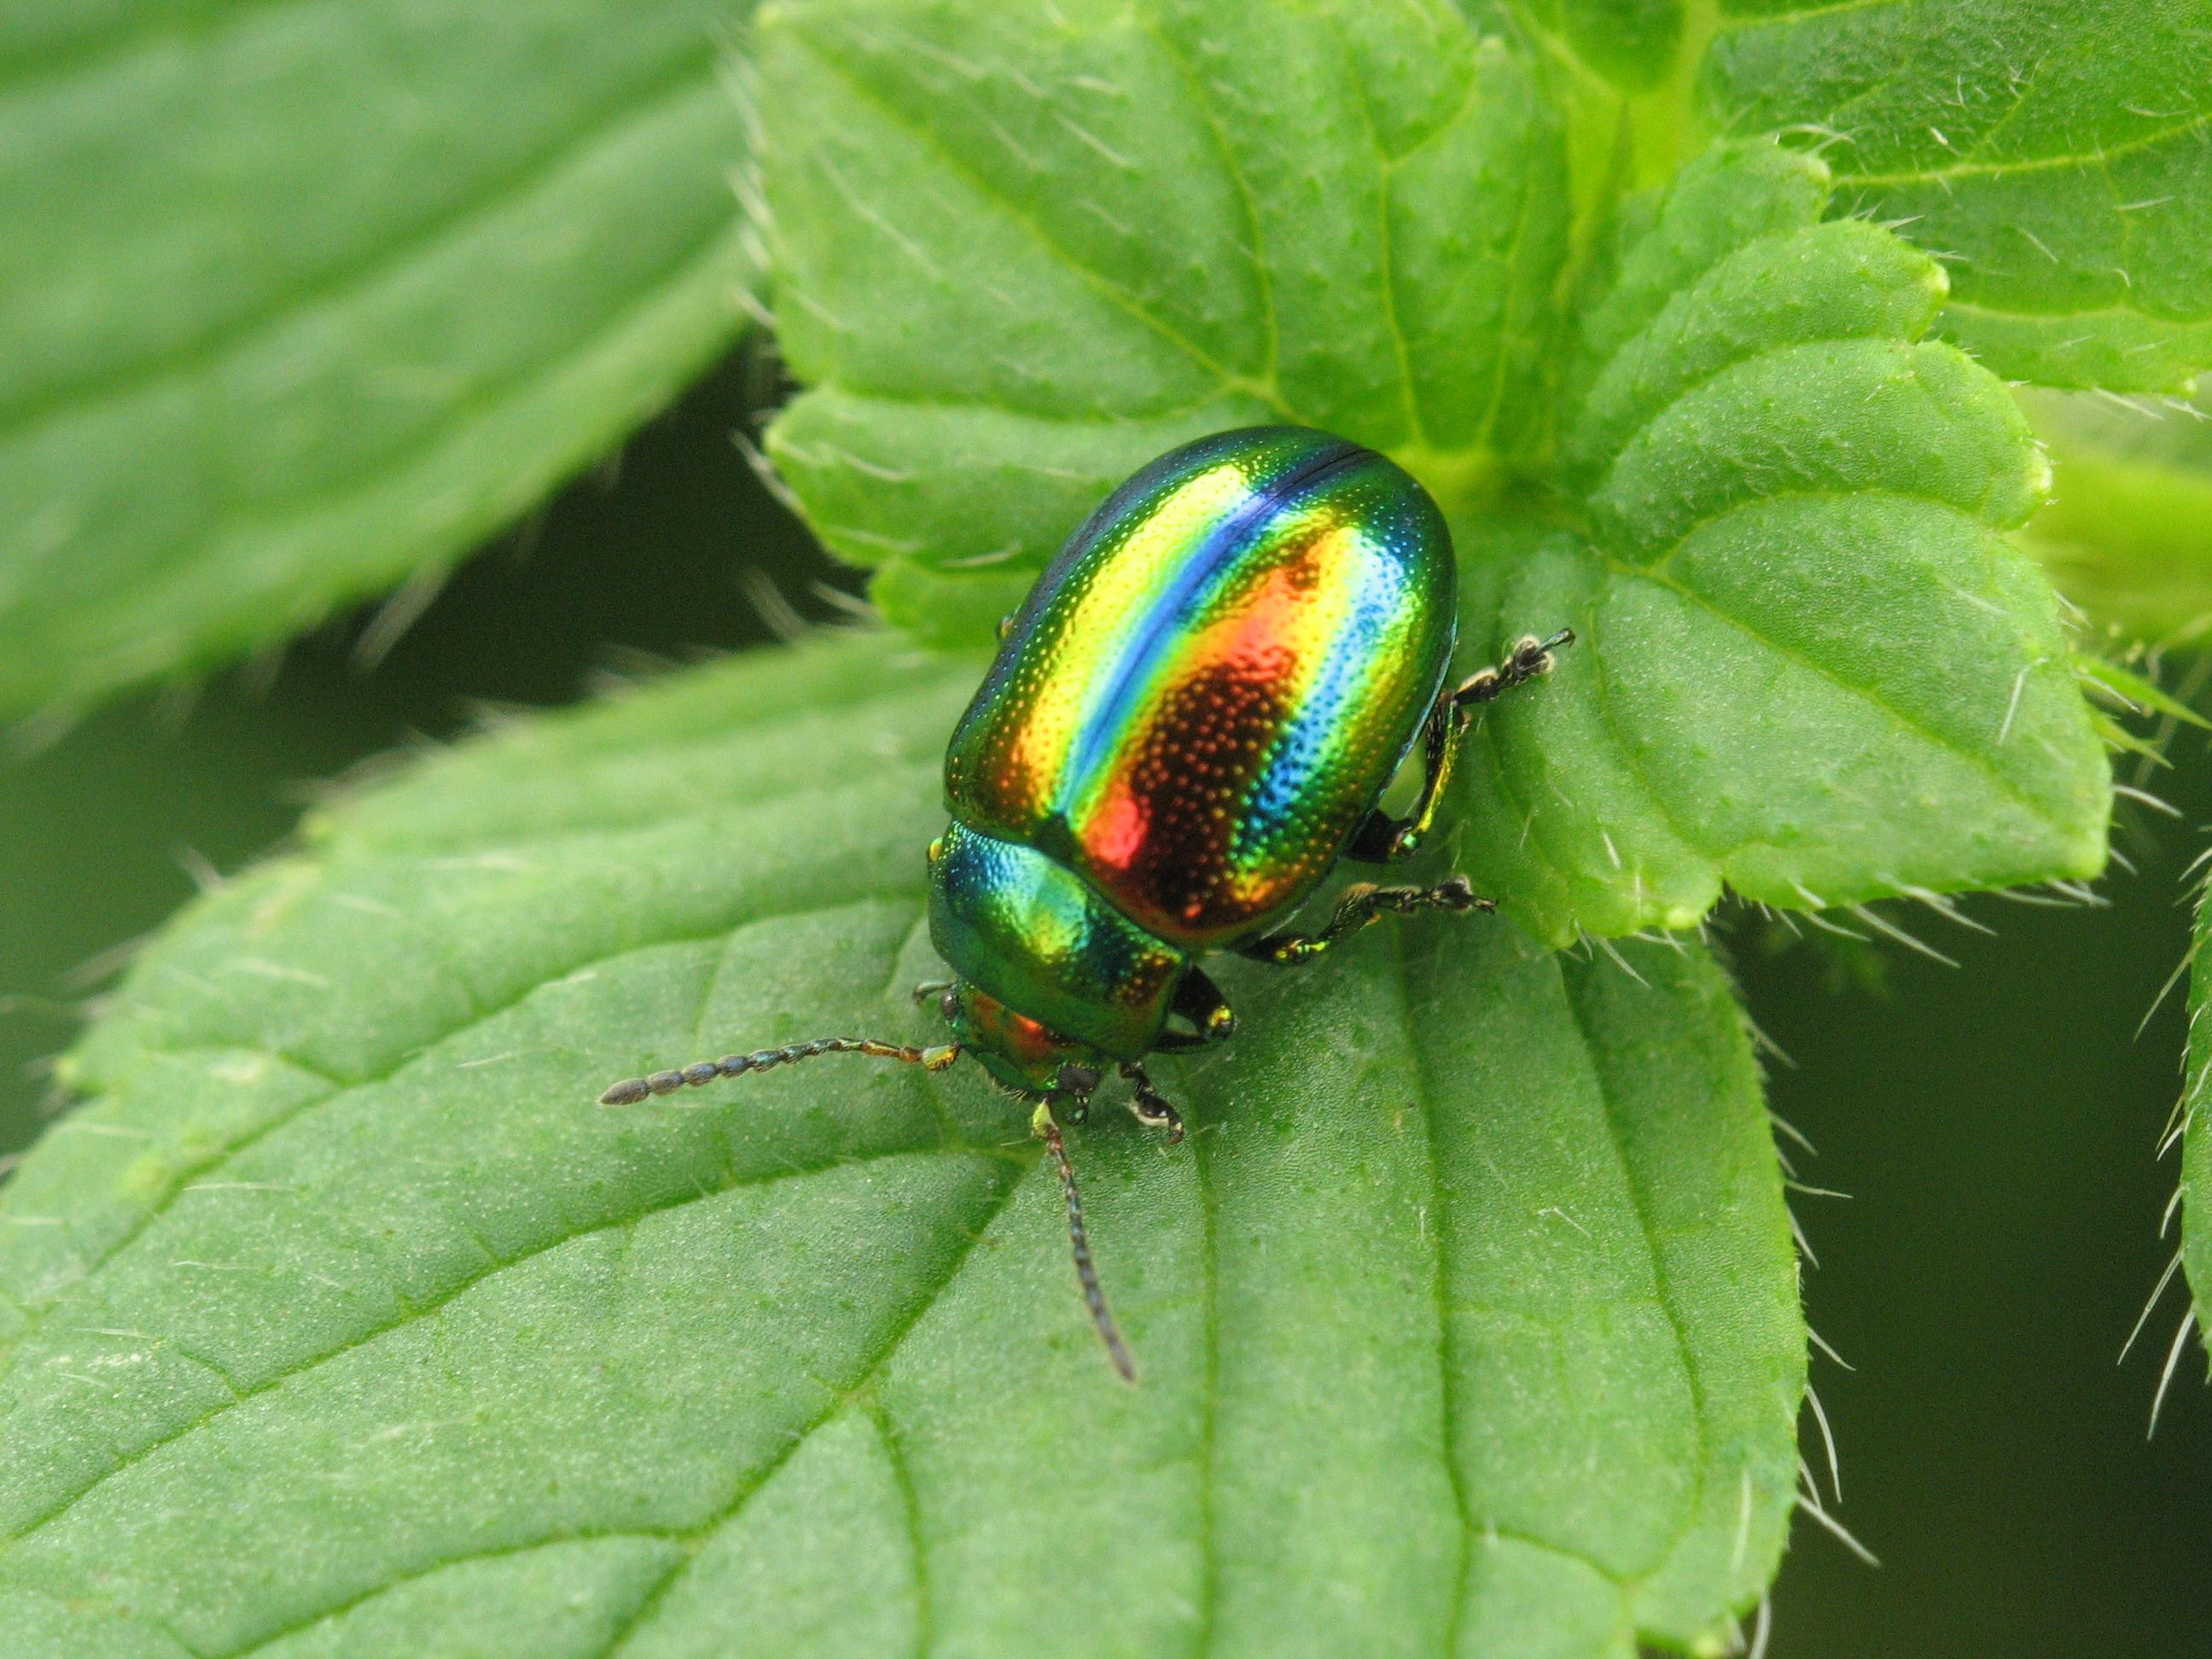 File Img 0487 Coleoptera Jpg Wikimedia Commons